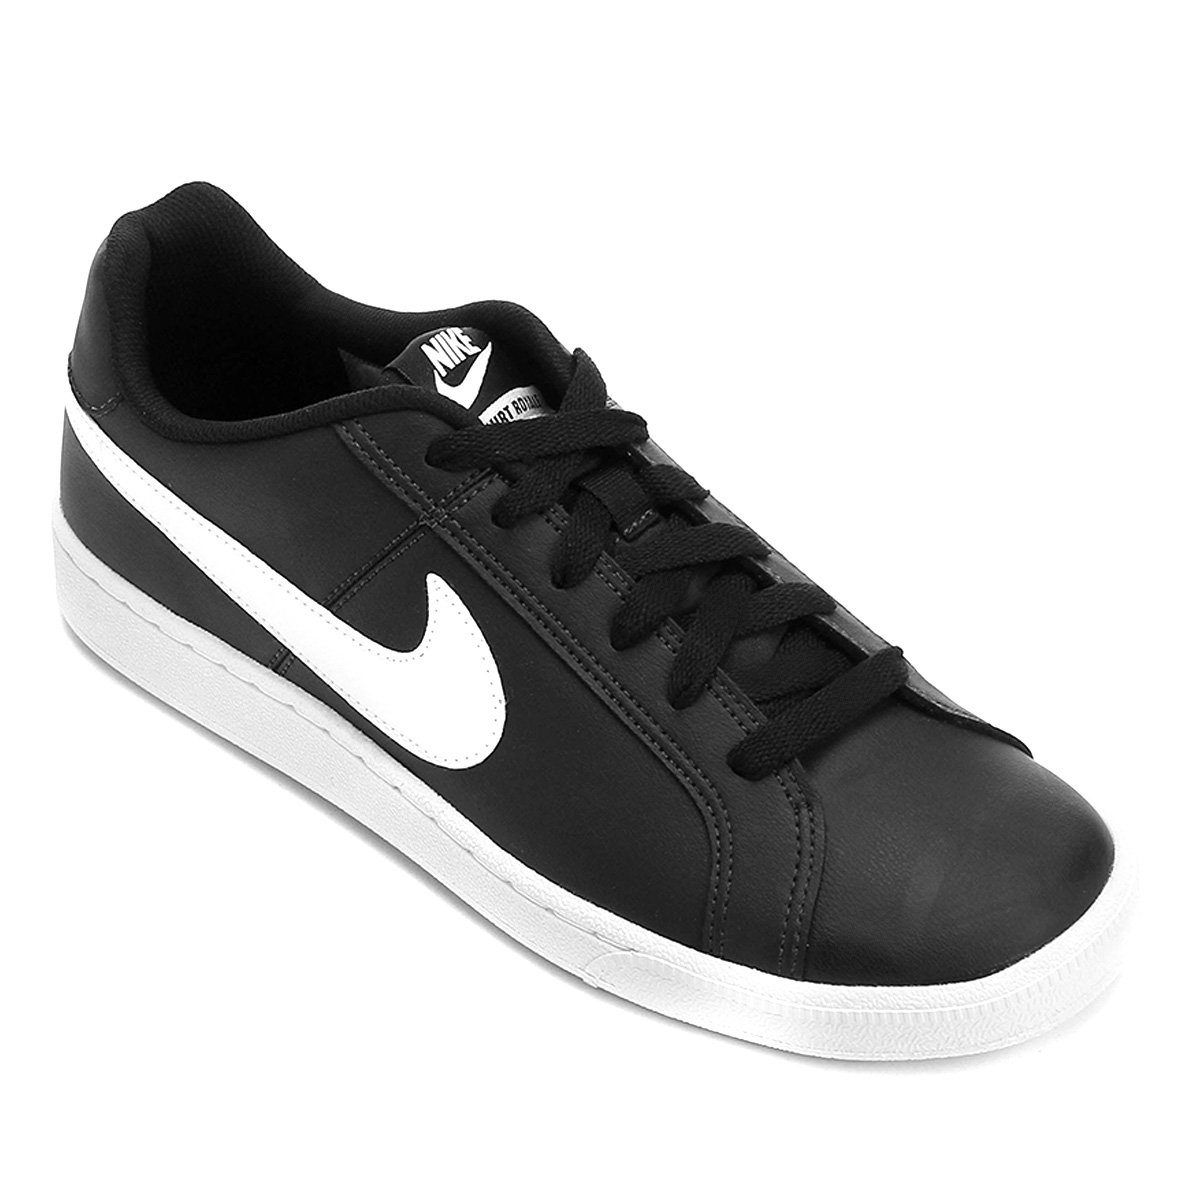 72eb0e19c5 Tênis Couro Nike Court Royale Masculino